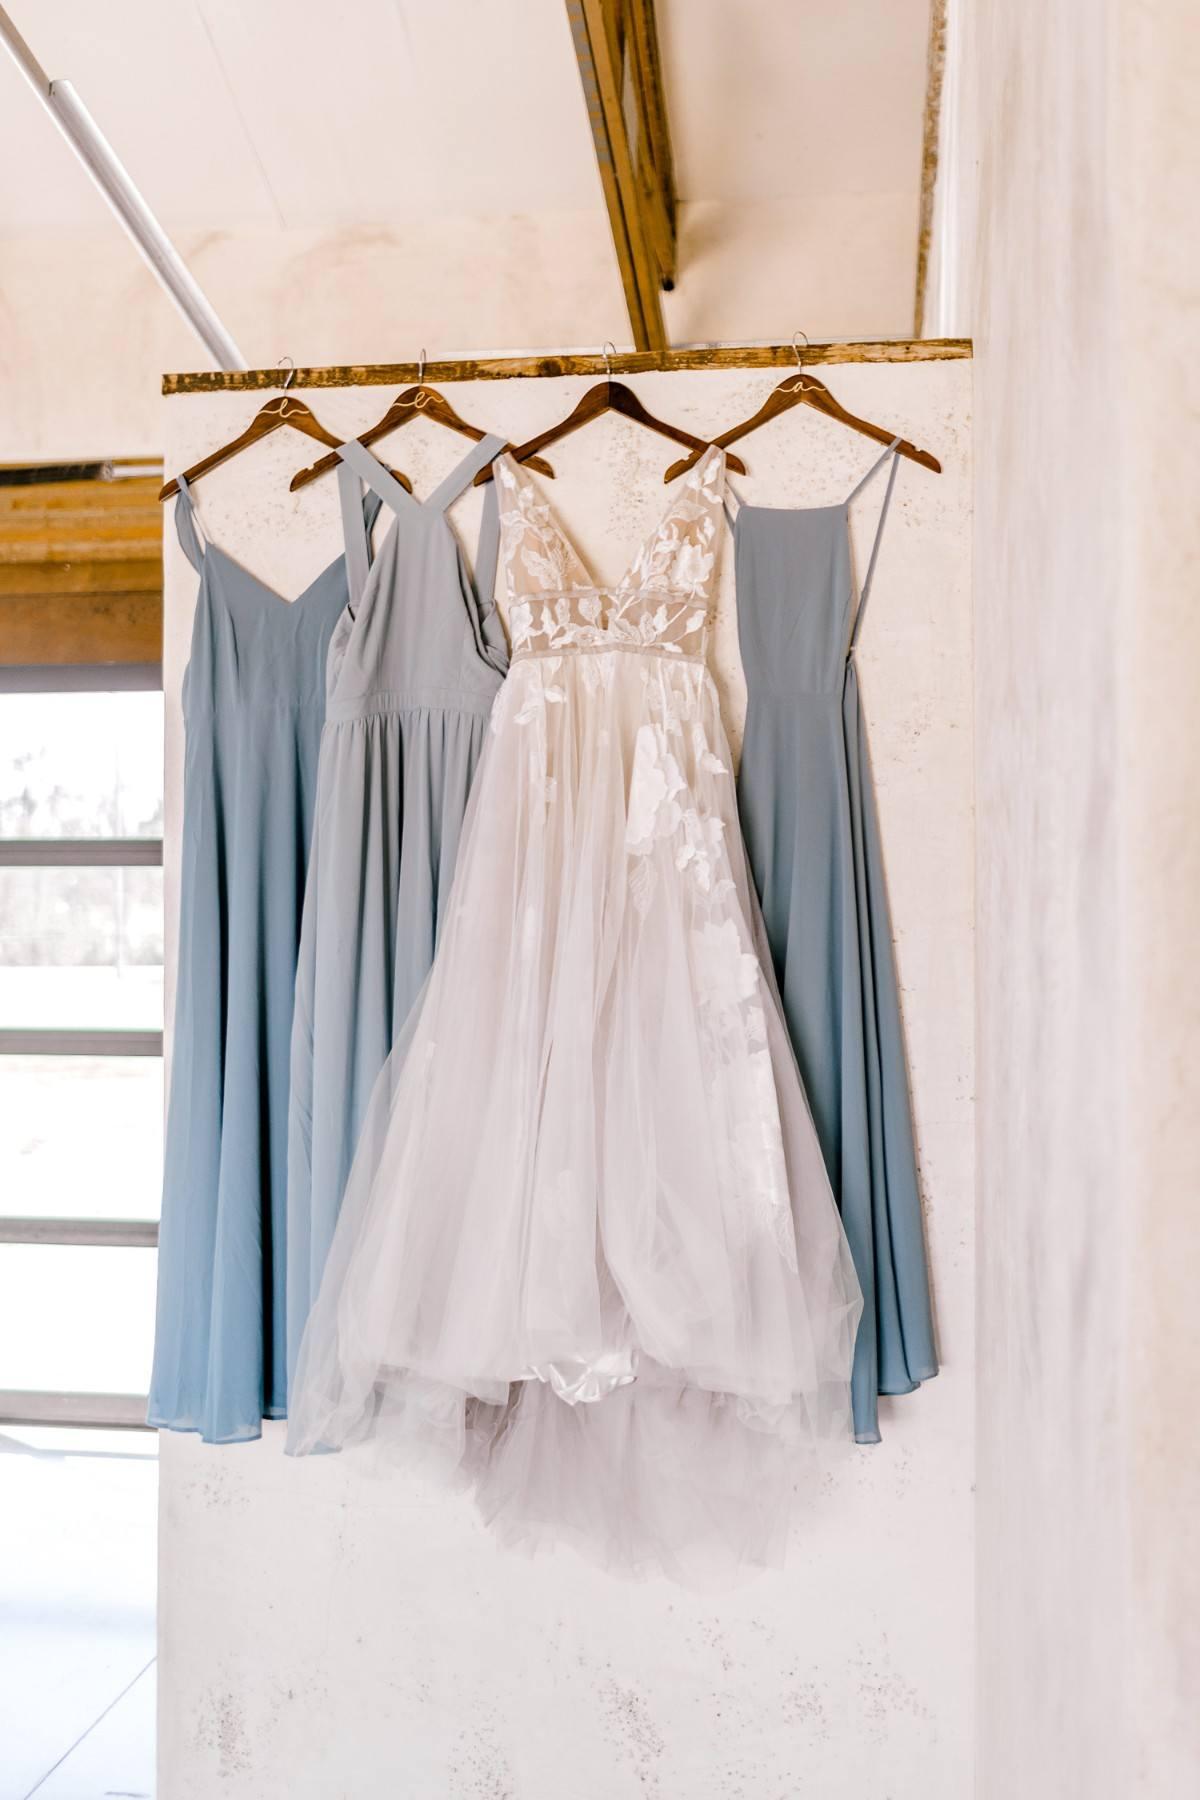 ennis-texas-wedding-photographer-kaitlyn-bullard-02.jpg